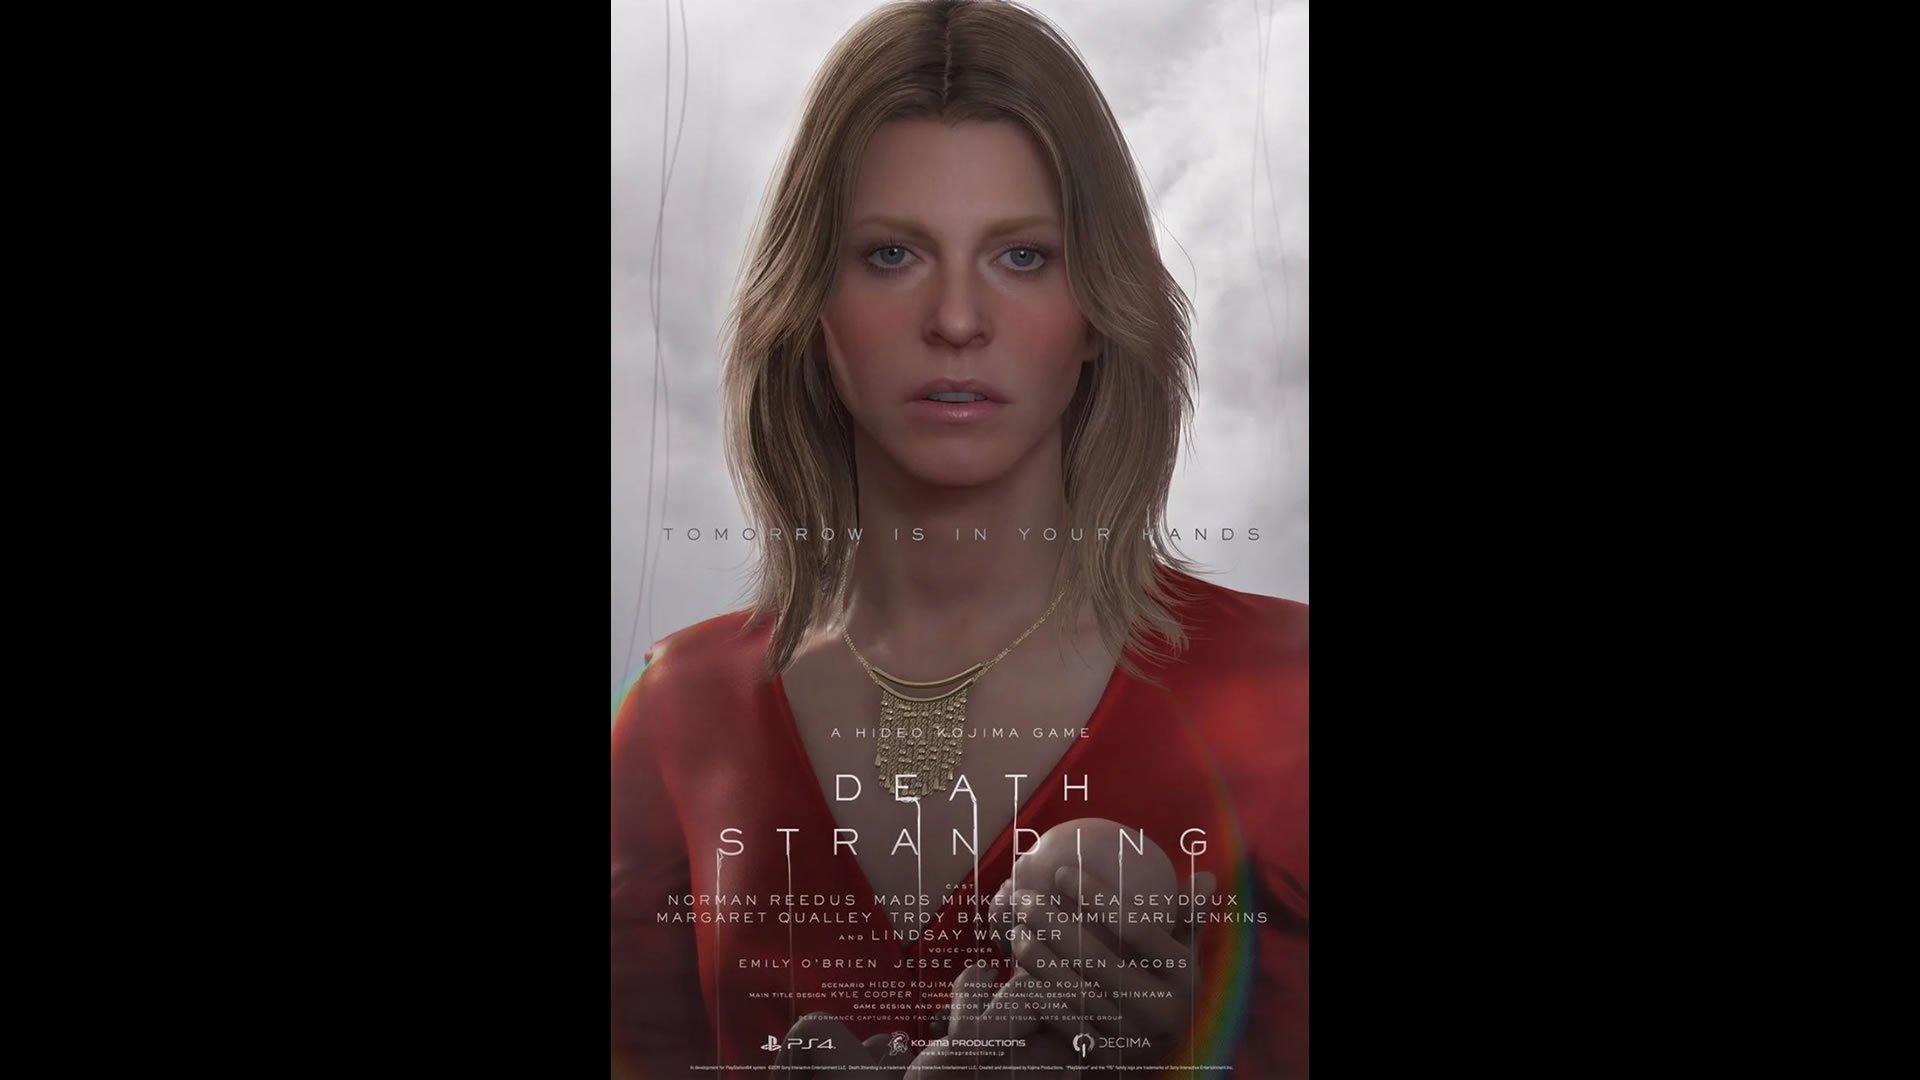 Lindsay Wagner voices Amelie